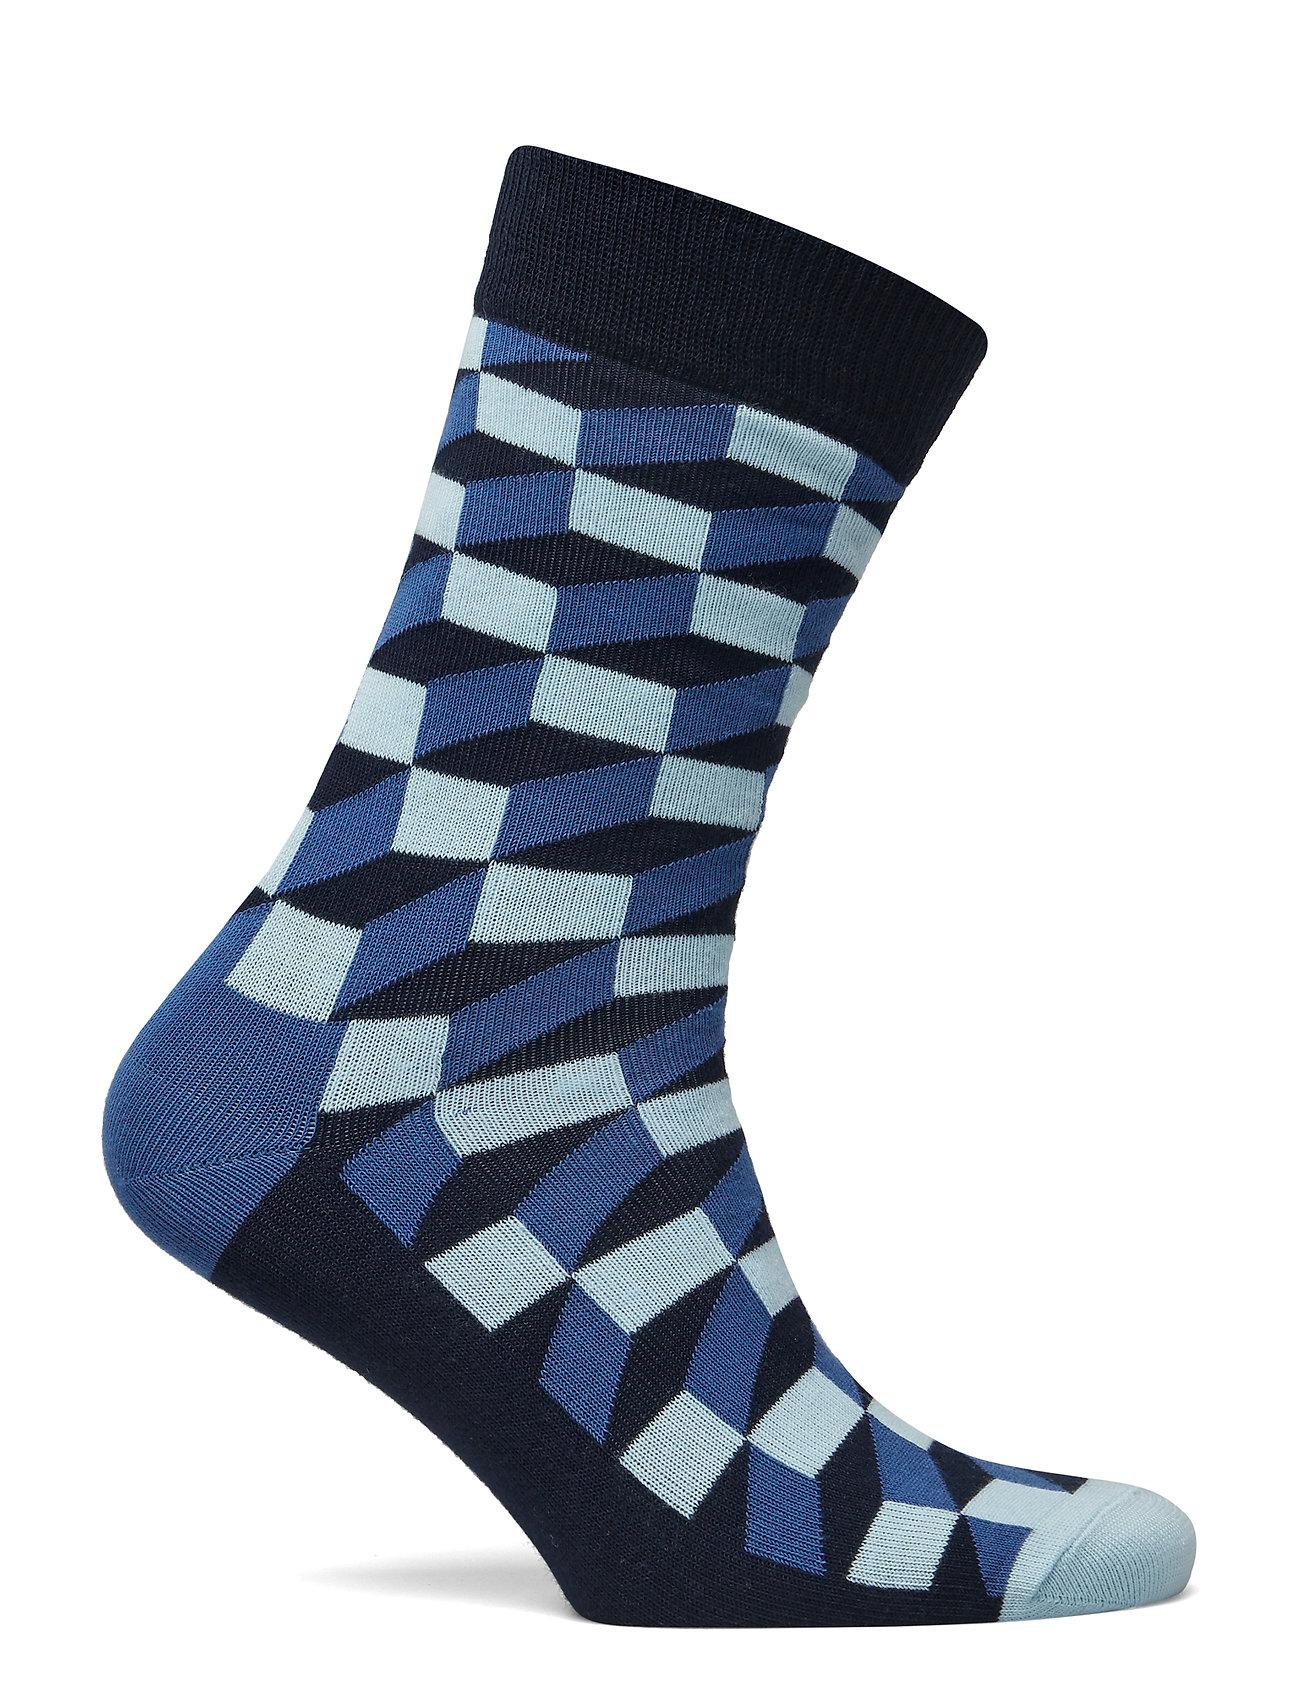 Yellow BNWT Happy Socks NEW Unisex Filled Optic Socks Blue